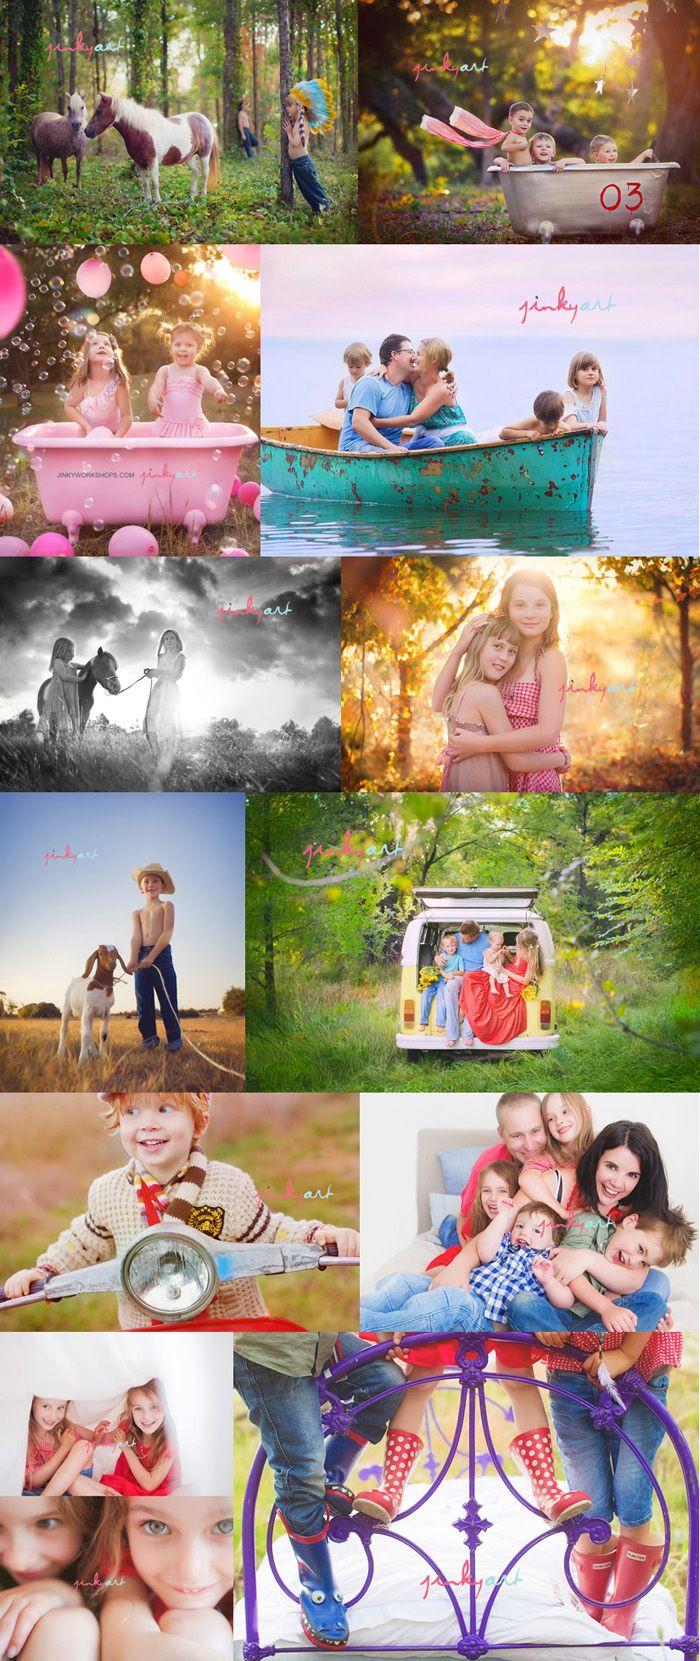 Ahhh - love all the photos! {Fun Family  Photoshoot Ideas} {Inspirational Photography}